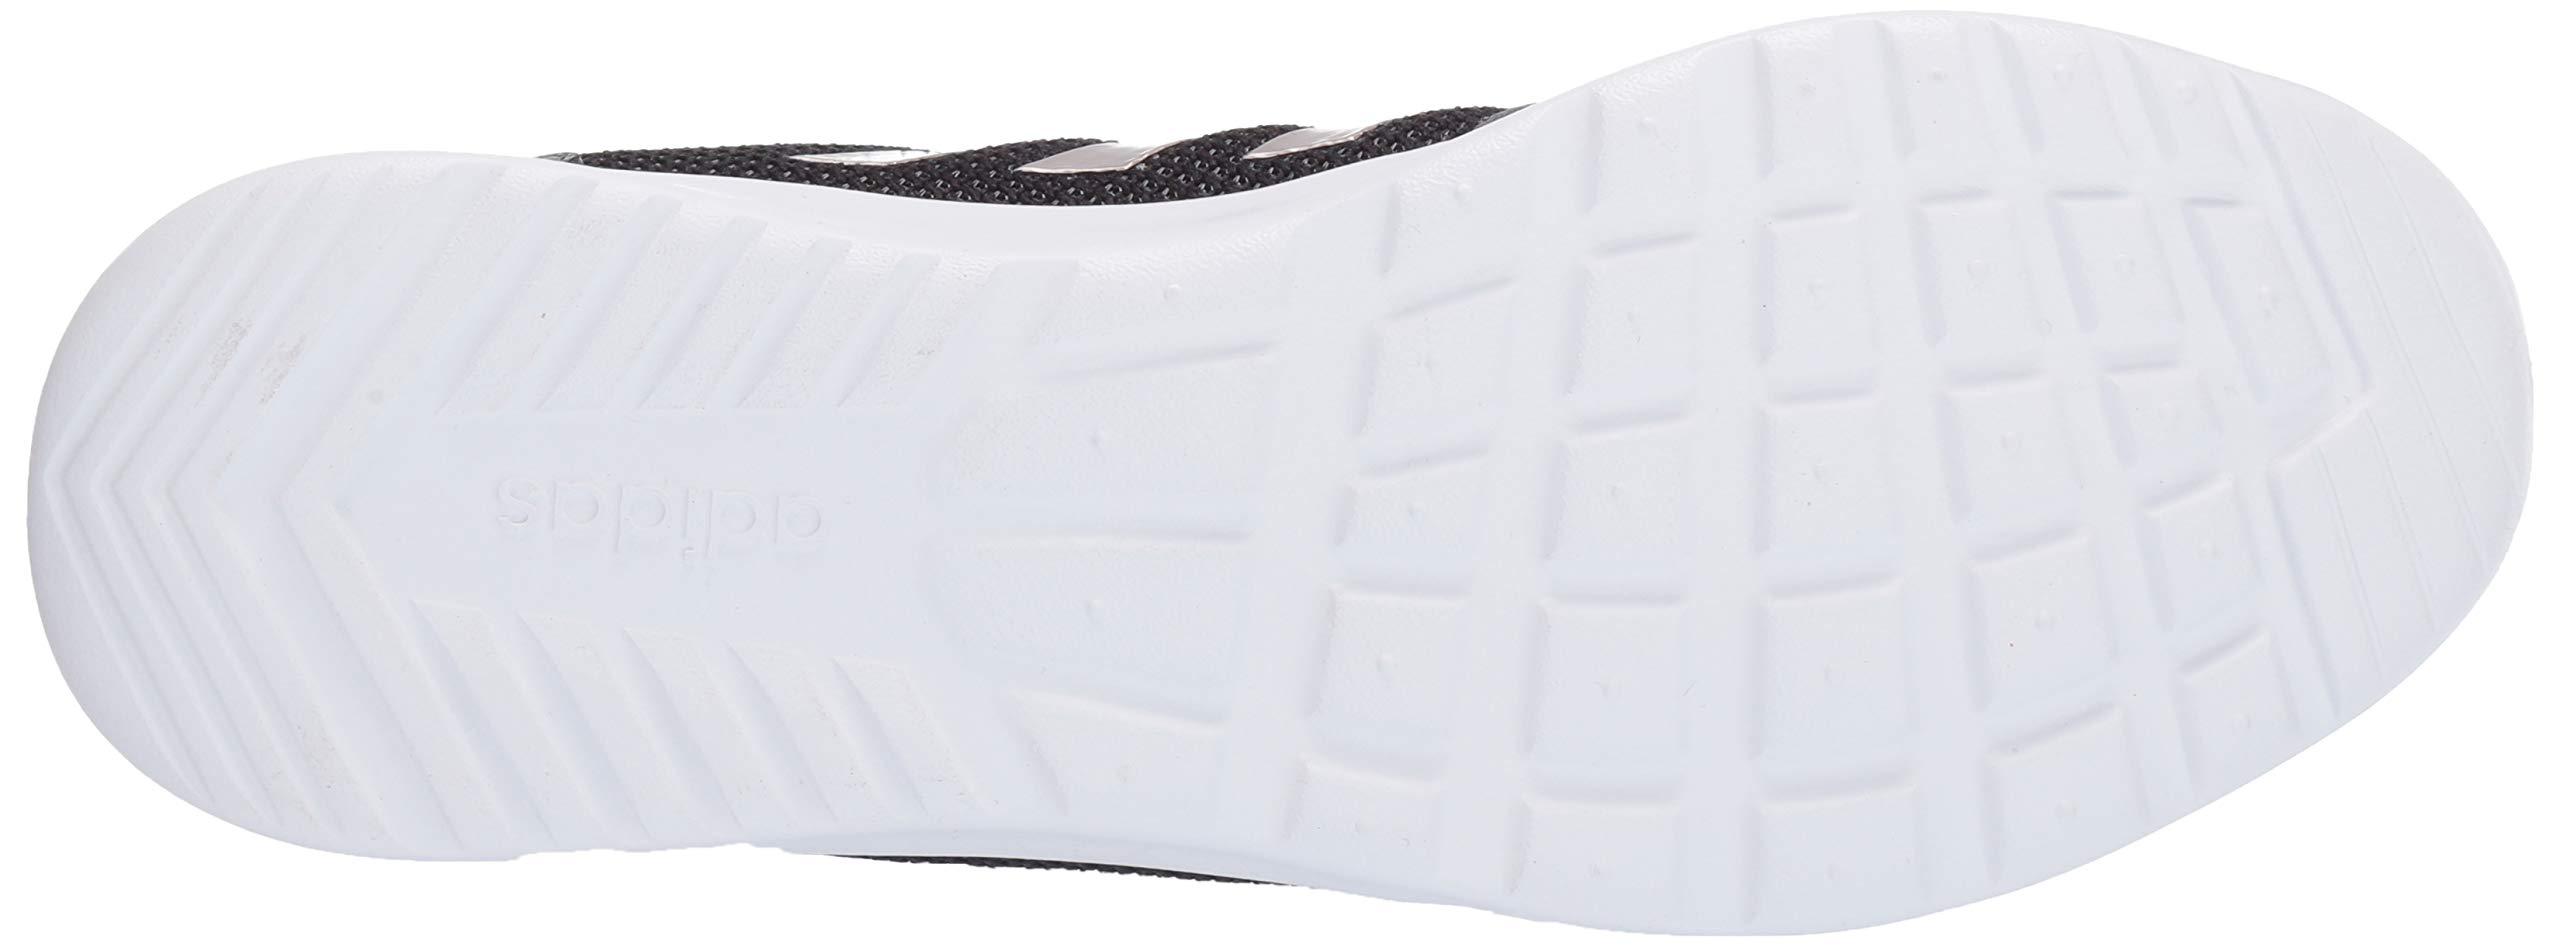 adidas Women's Cloudfoam QT Racer, Legend Ivy/Platino Metallic/Black, 5.5 M US by adidas (Image #3)